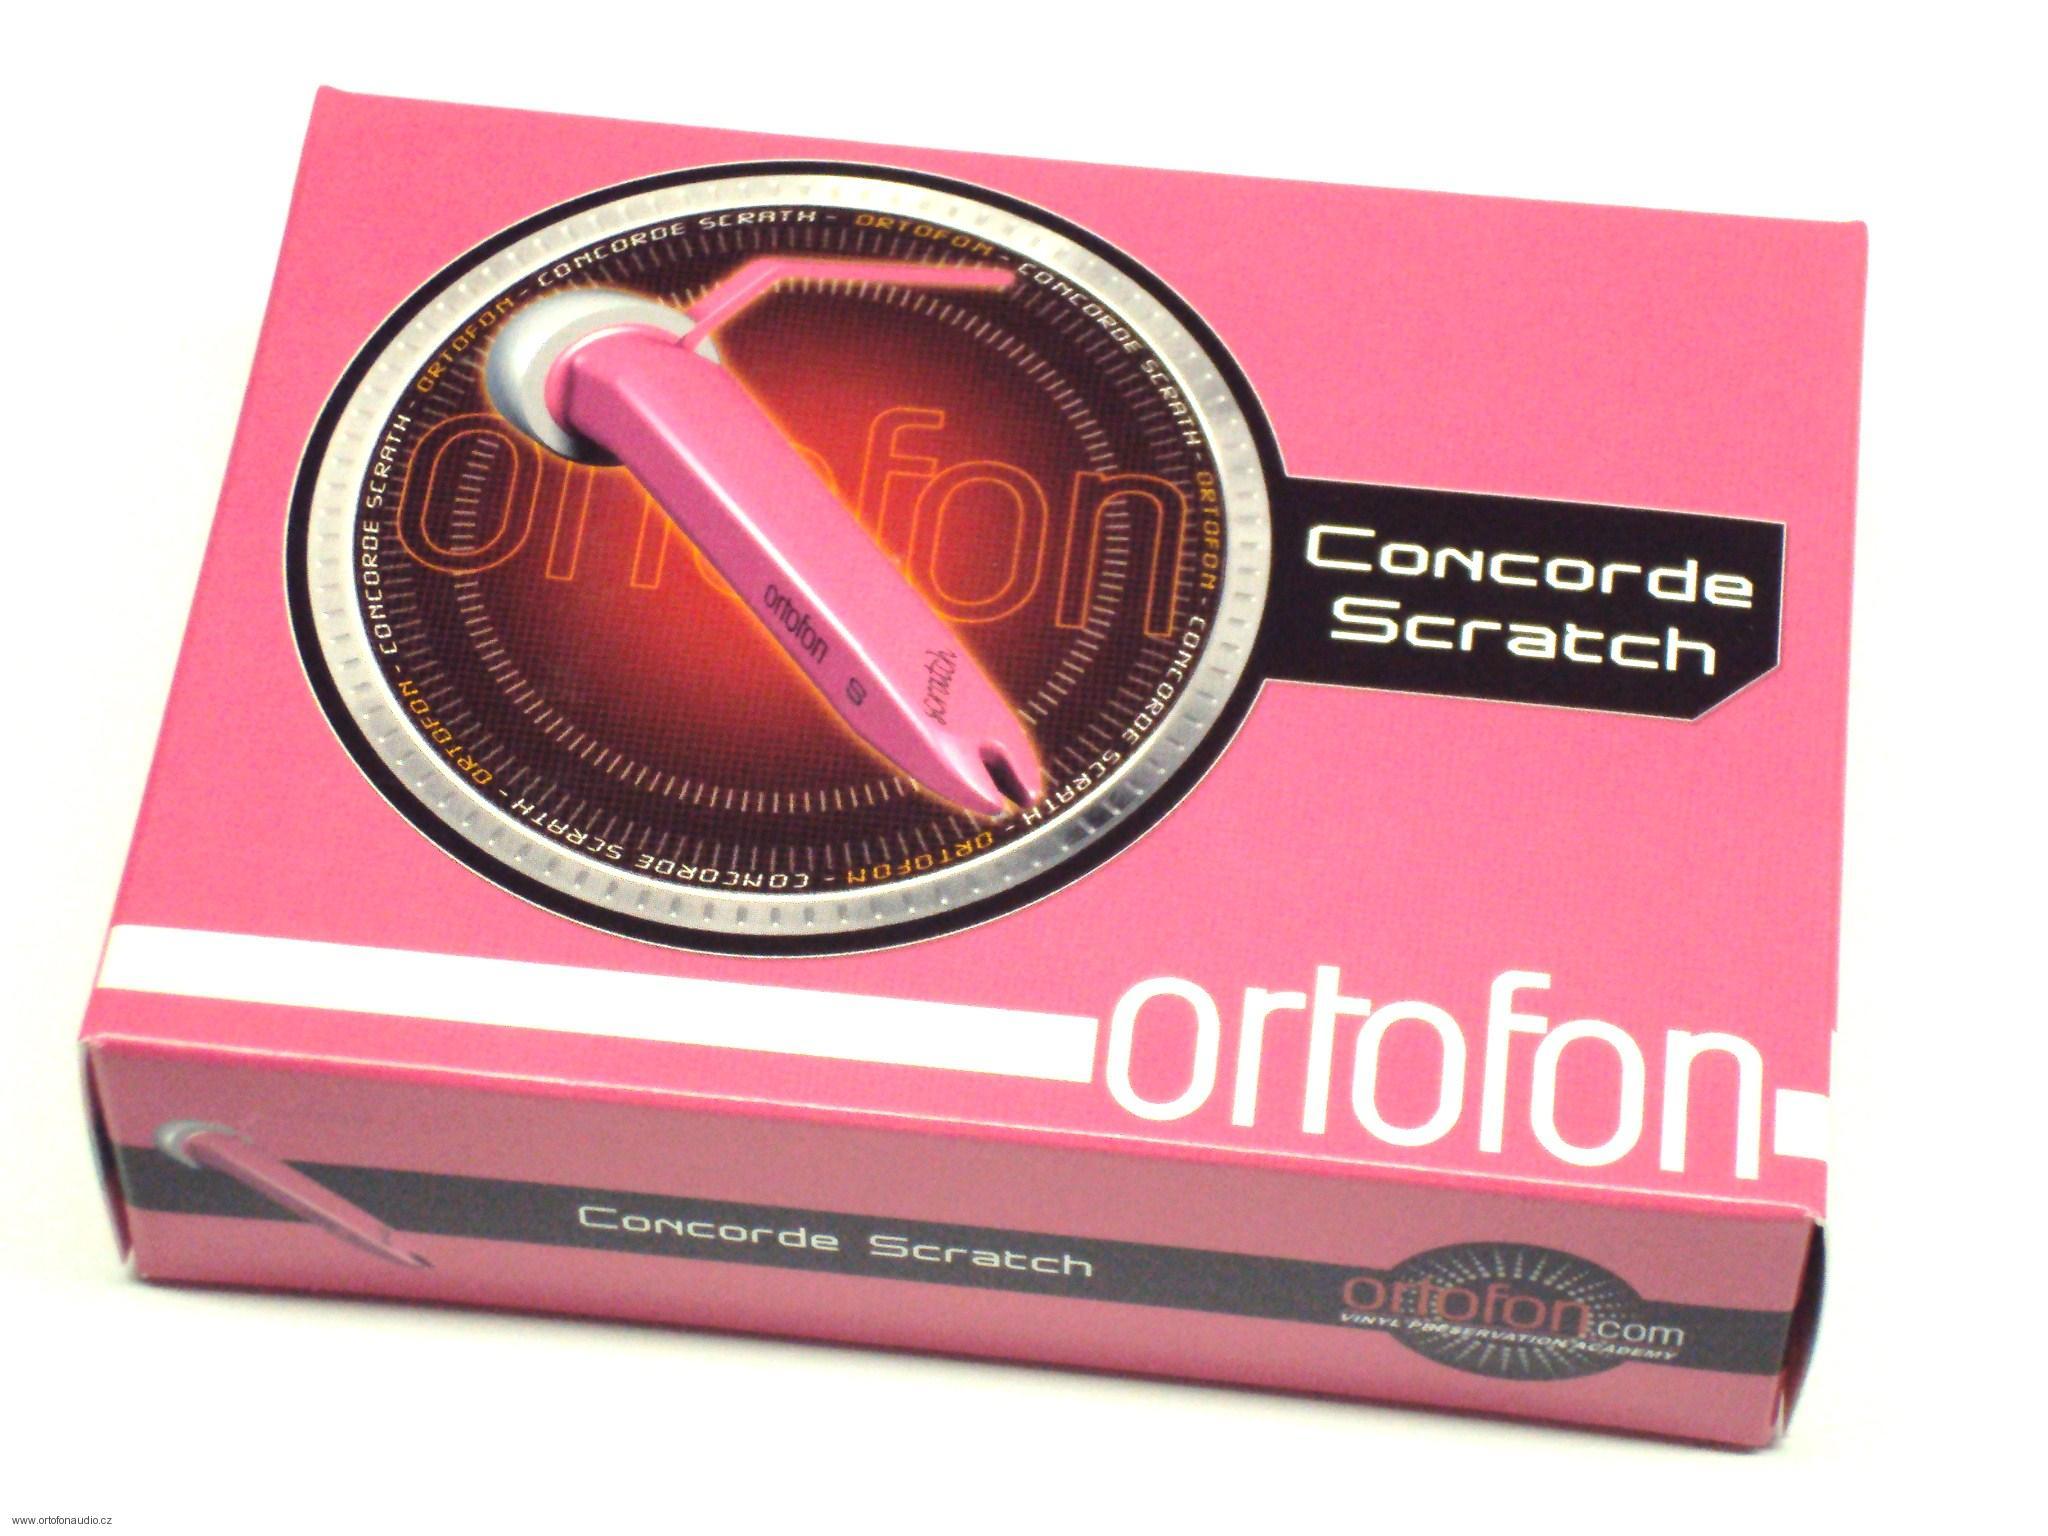 Ortofon Concorde Scratch Single